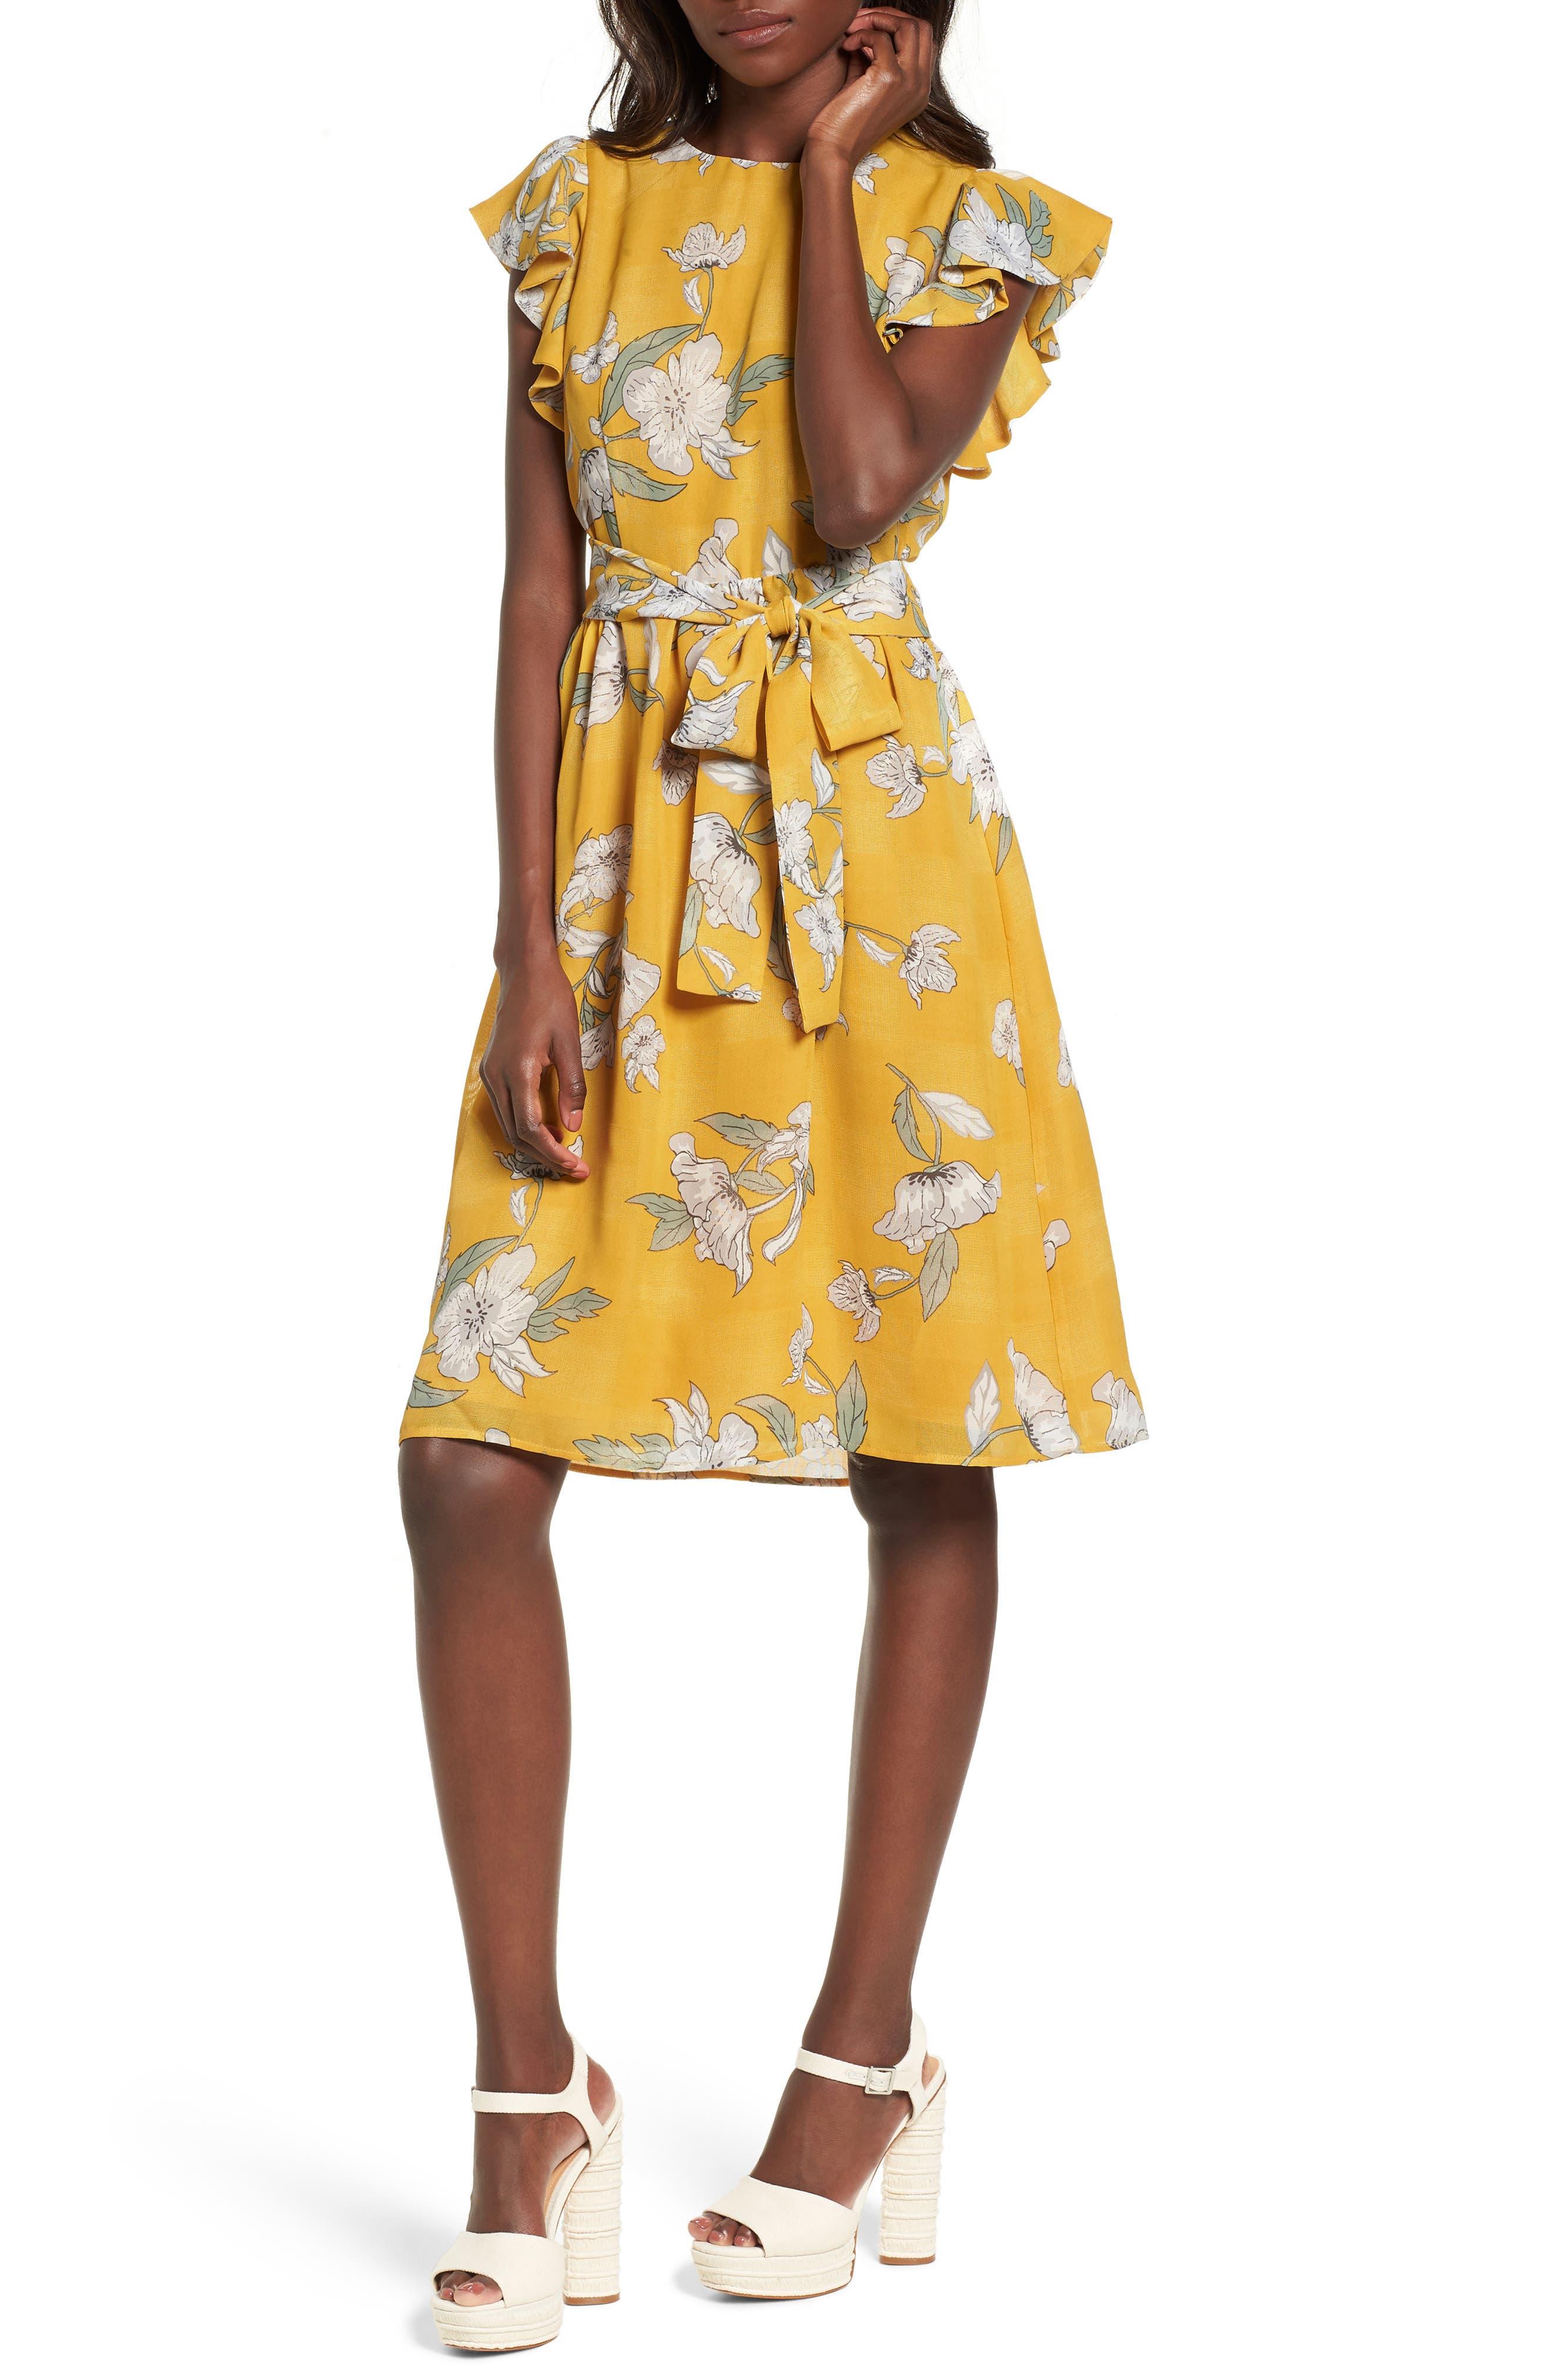 Chriselle x J.O.A. Fit & Flare Dress,                             Main thumbnail 1, color,                             700